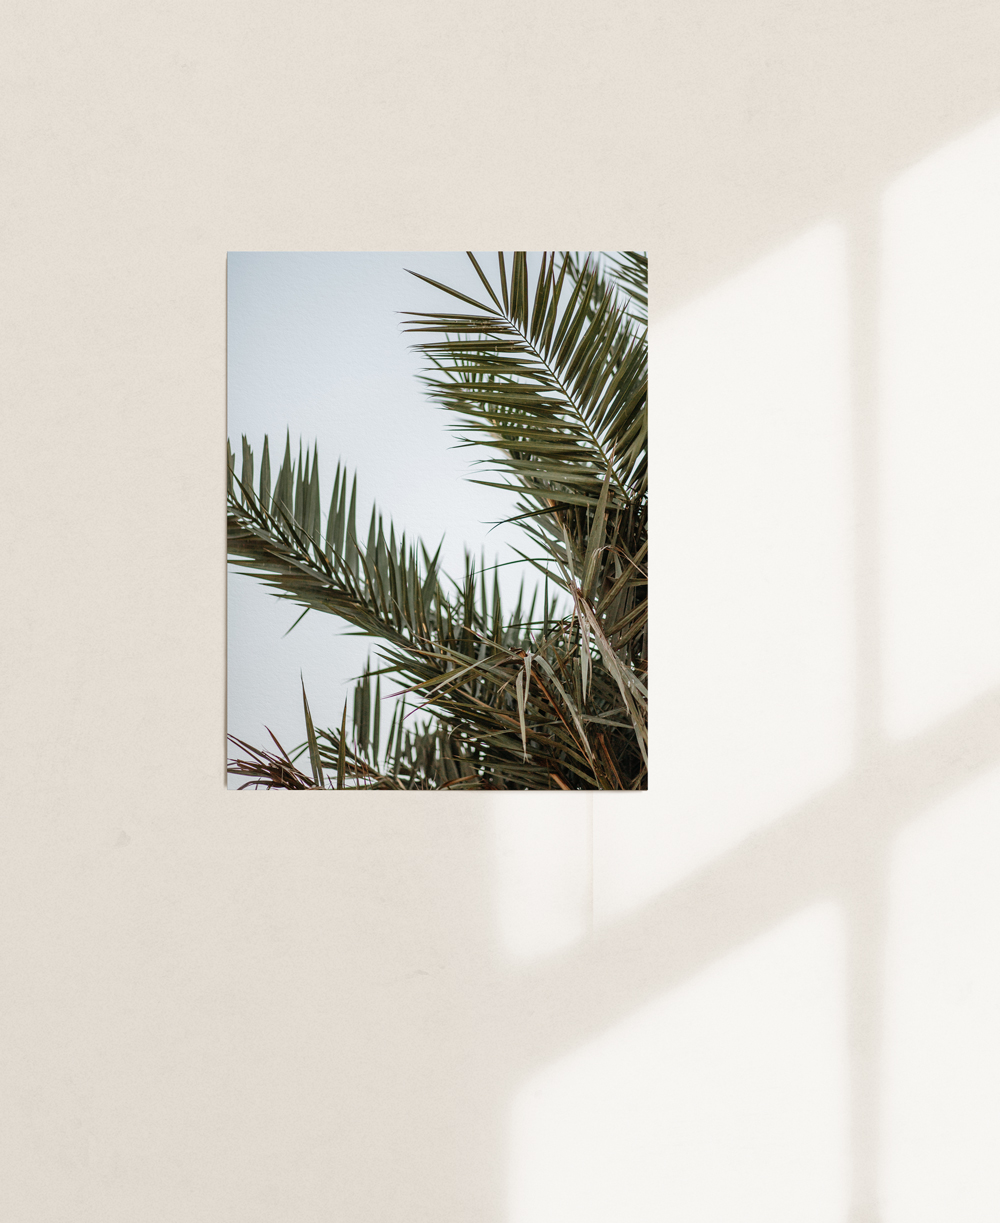 nicischwab-prints-02-014